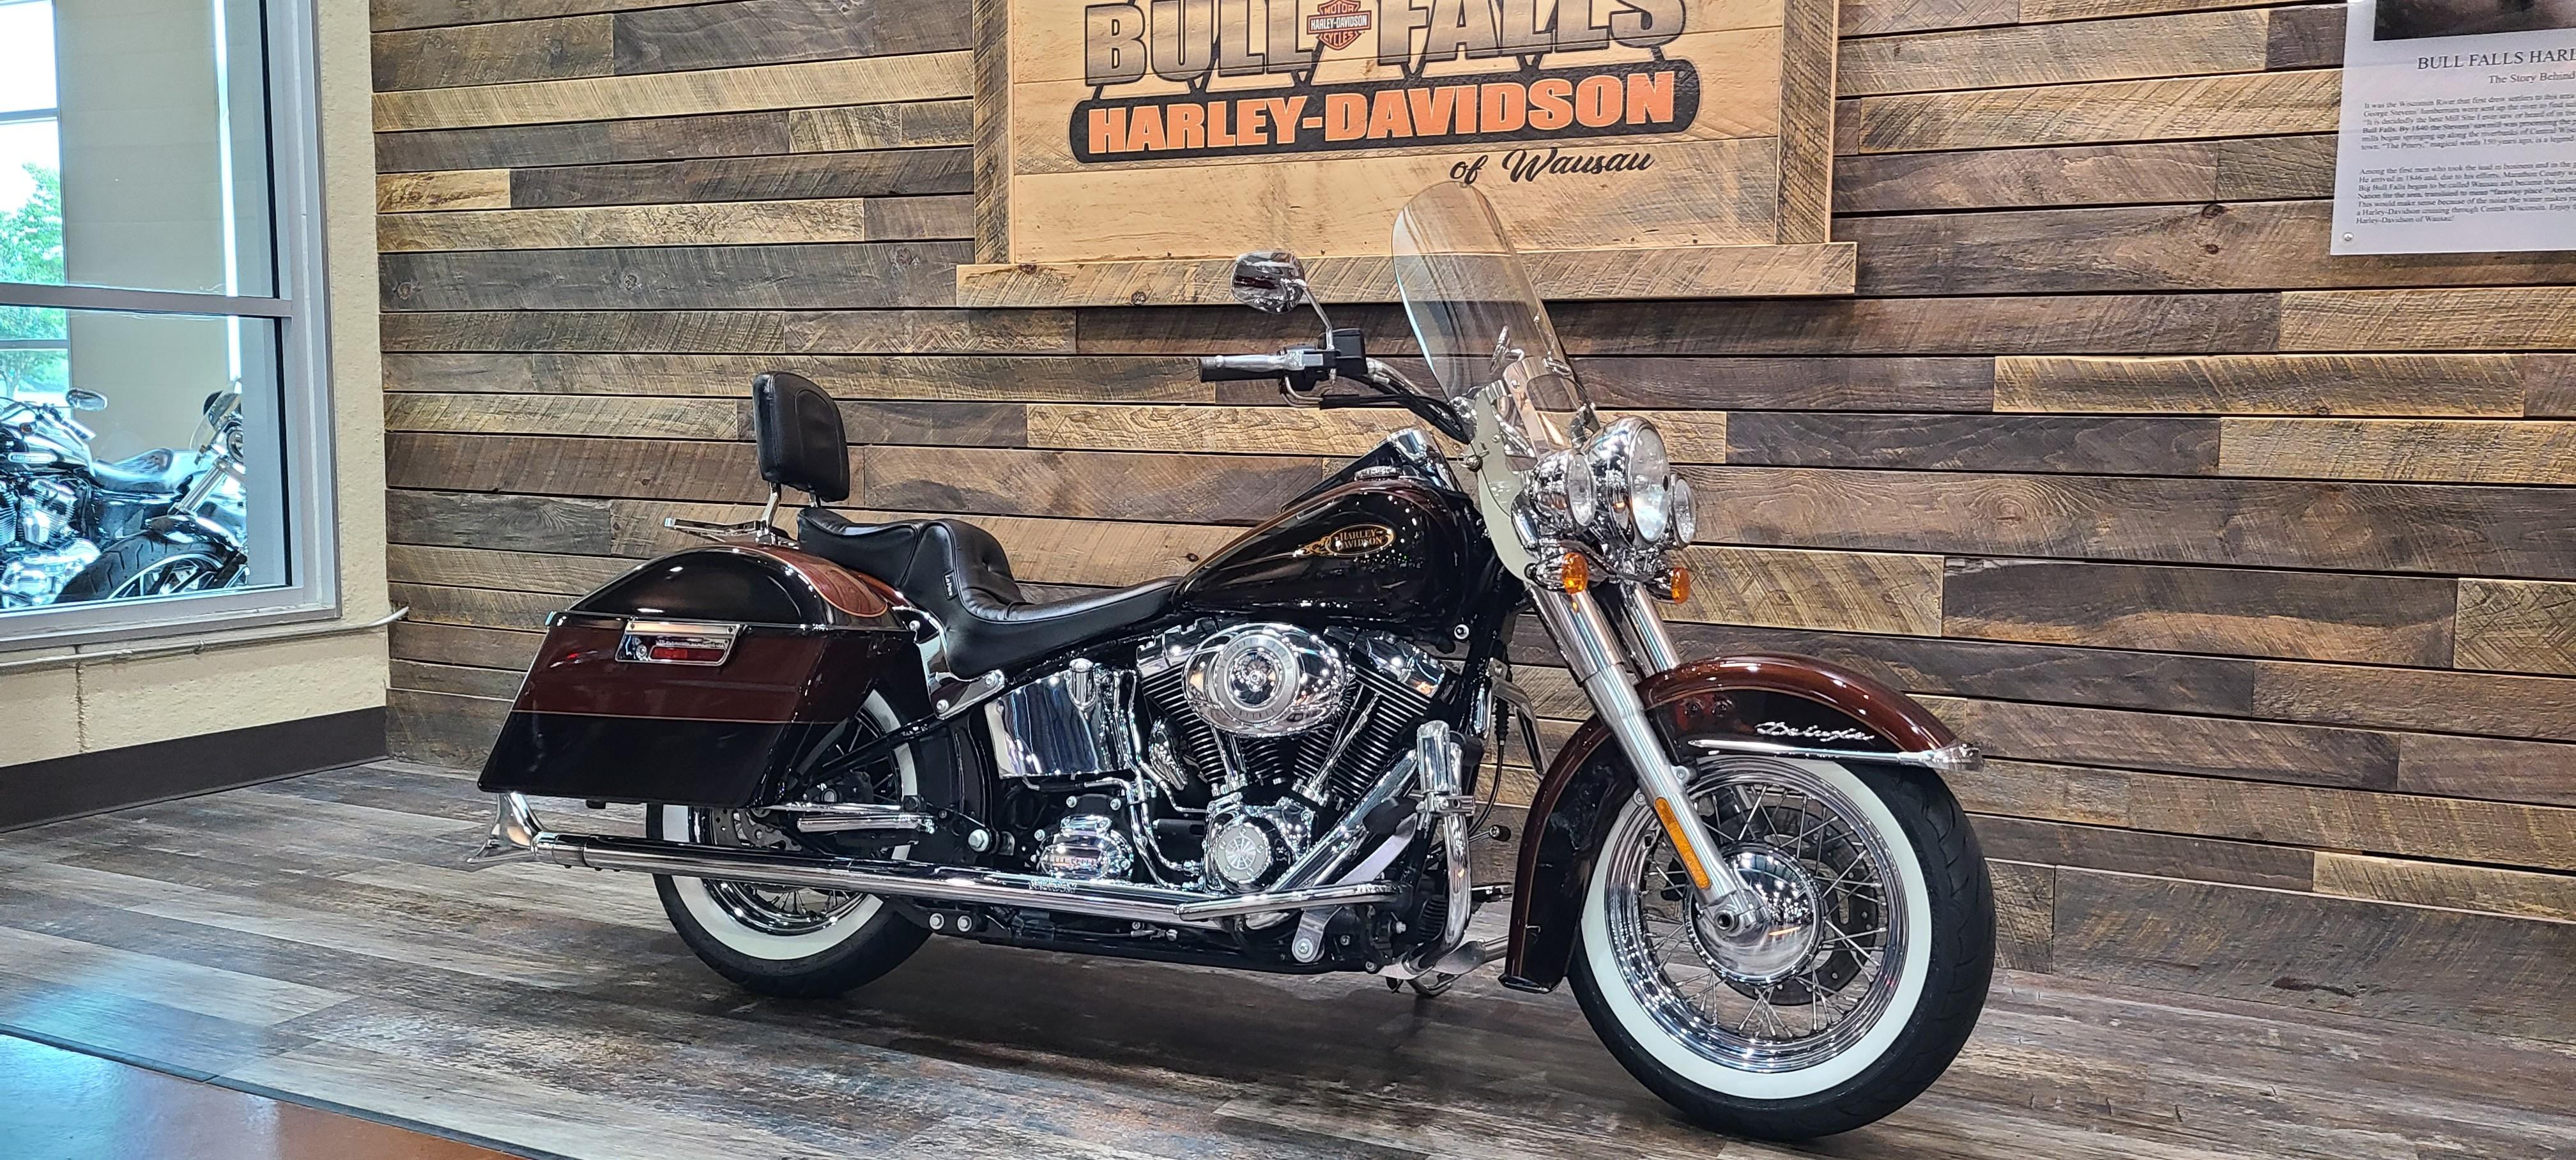 2009 Harley-Davidson Softail Deluxe at Bull Falls Harley-Davidson